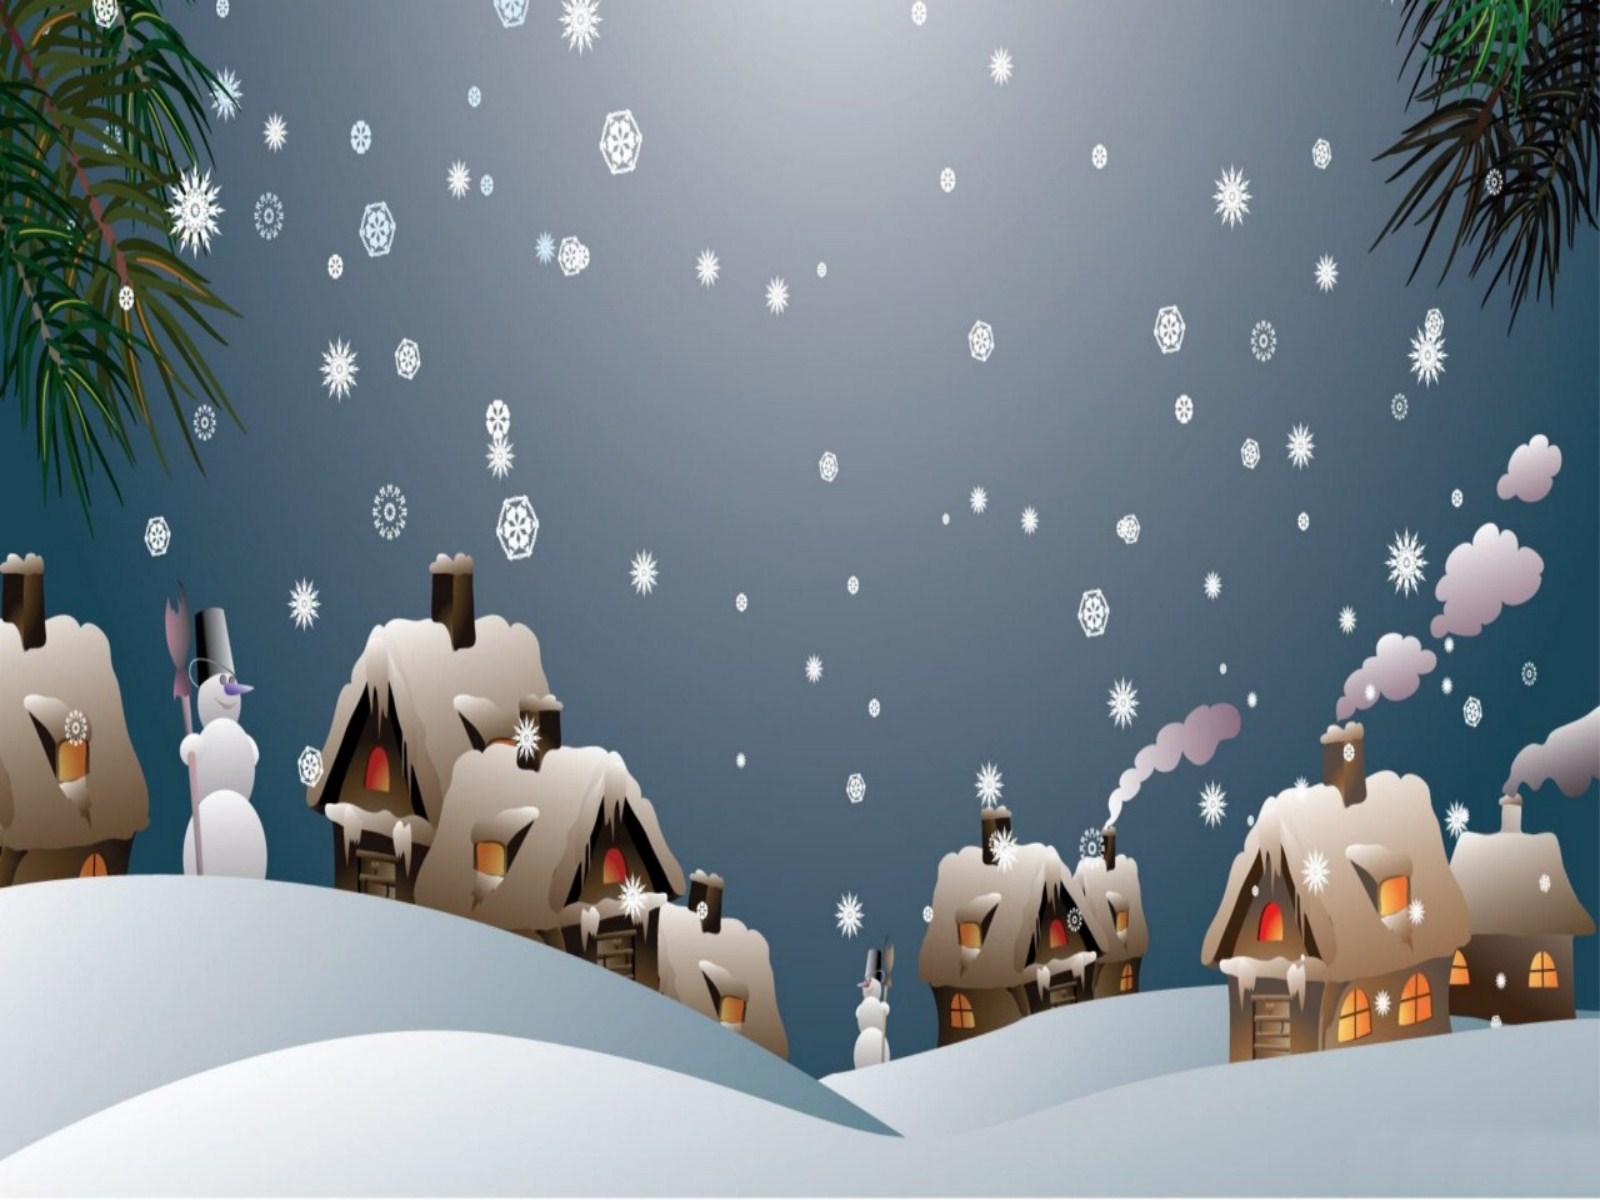 Free animated snowy christmas wallpaper wallpapersafari - Free animated wallpaper s8 ...